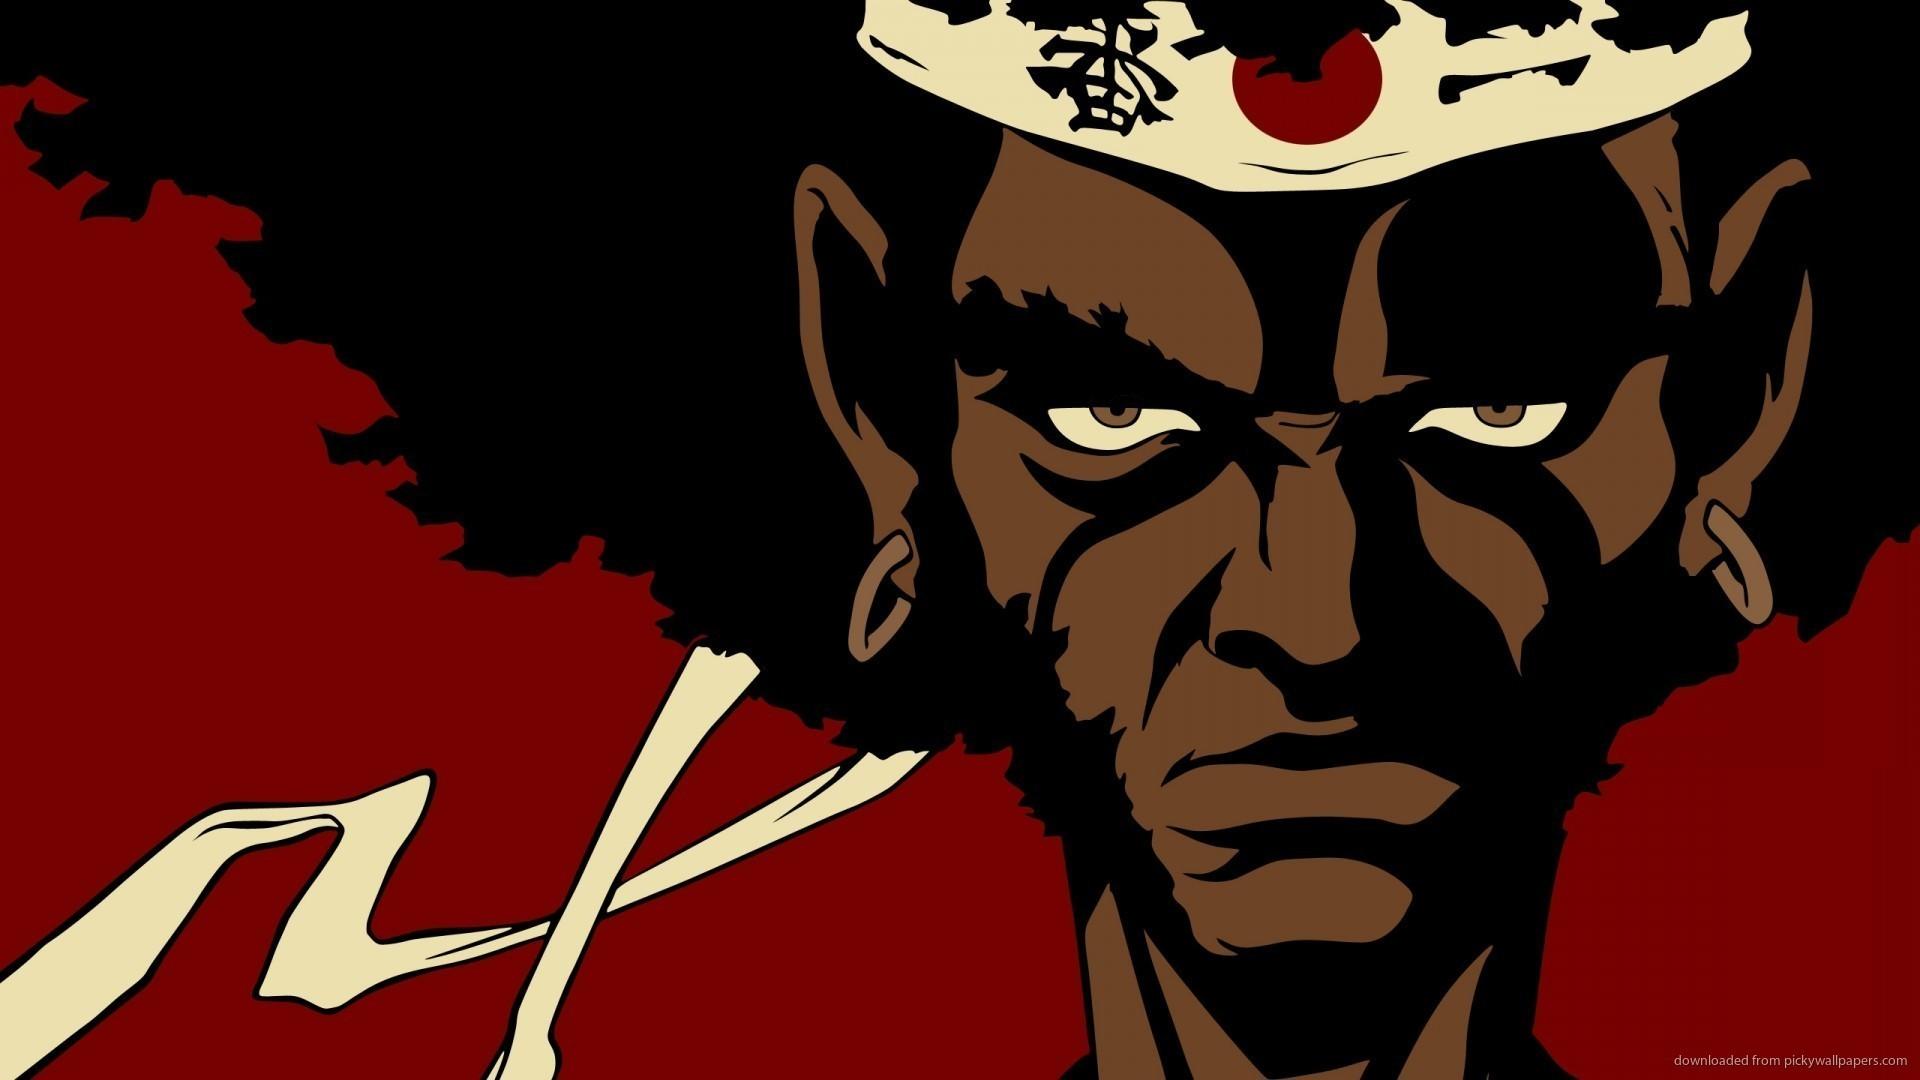 Afro Samurai Anime Cartoon Wallpaper picture